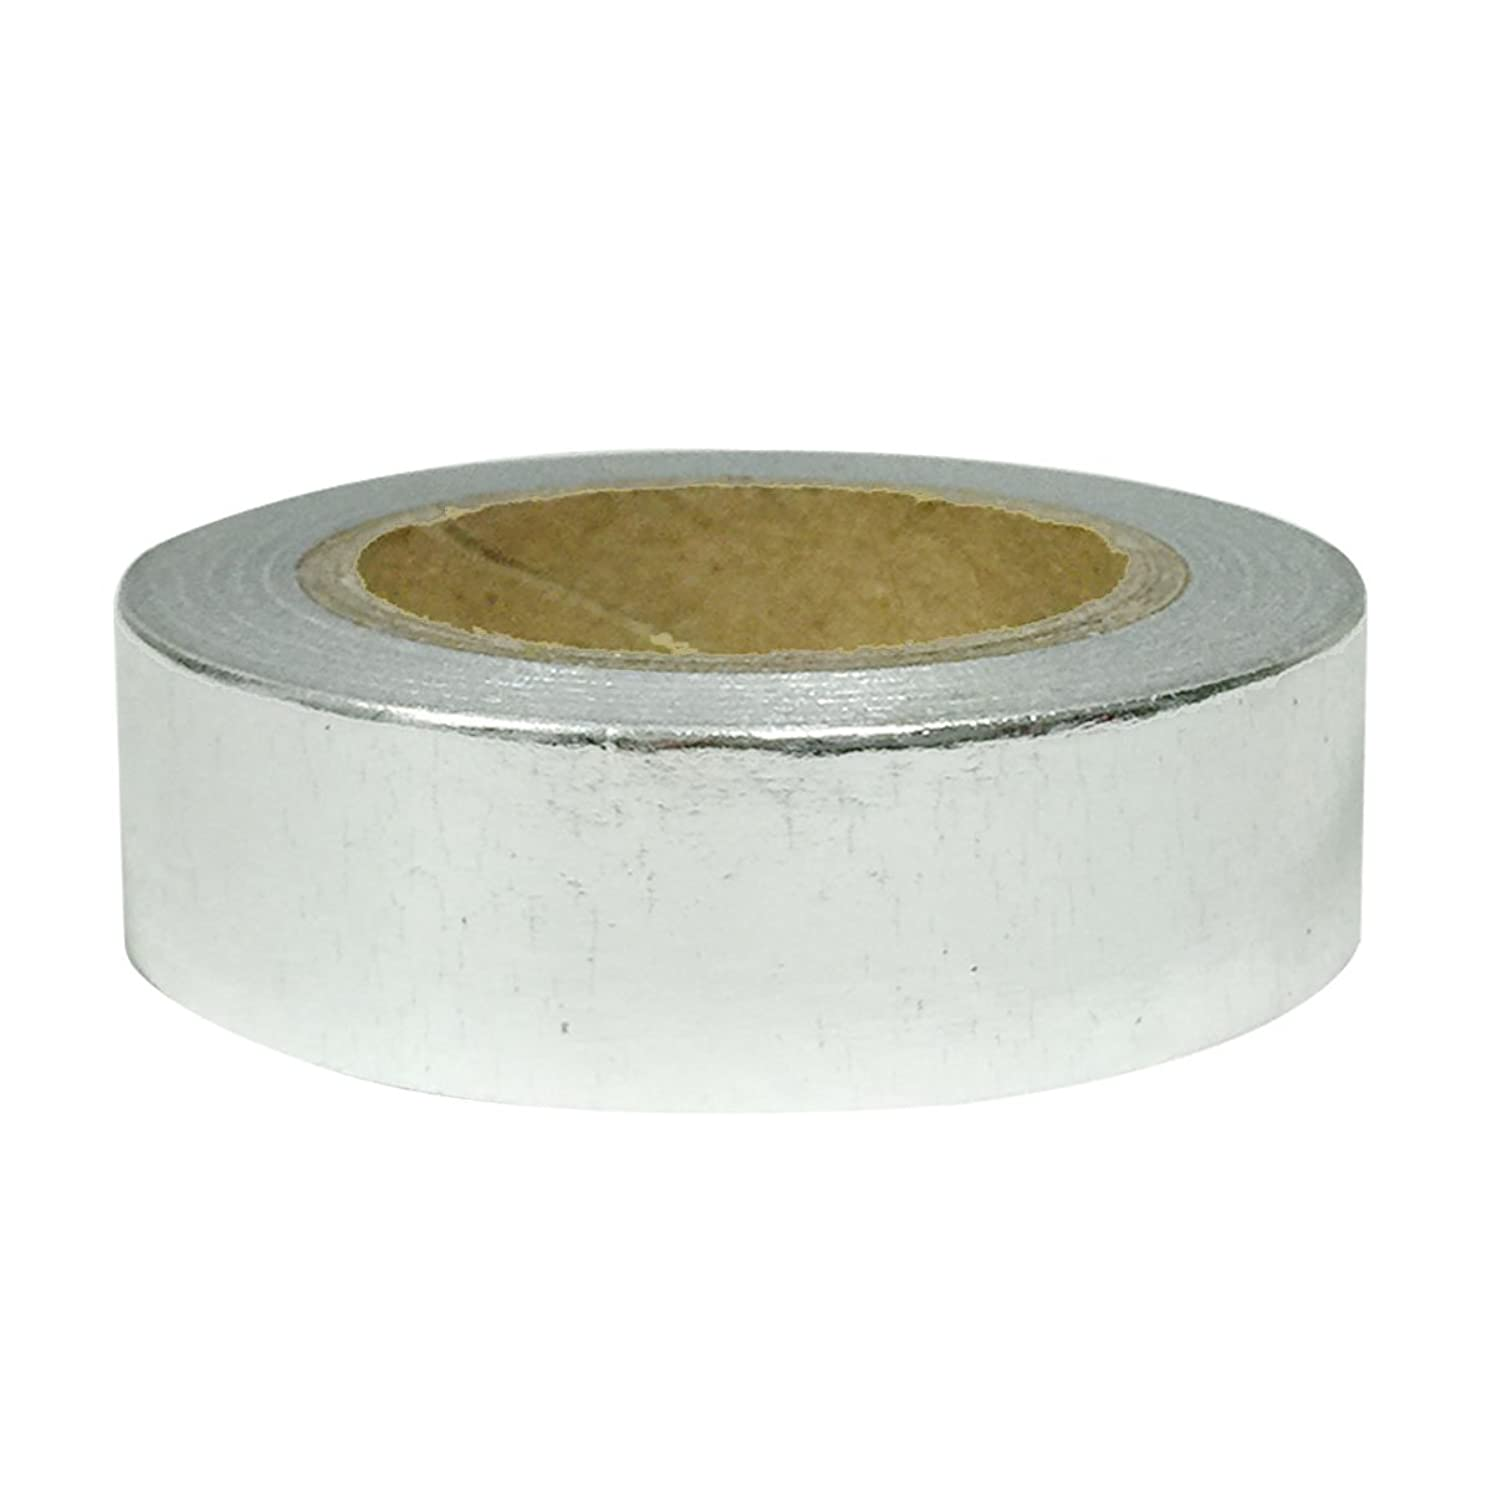 Allydrew Washi Tapes Decorative Masking Tapes, Shiny Silver